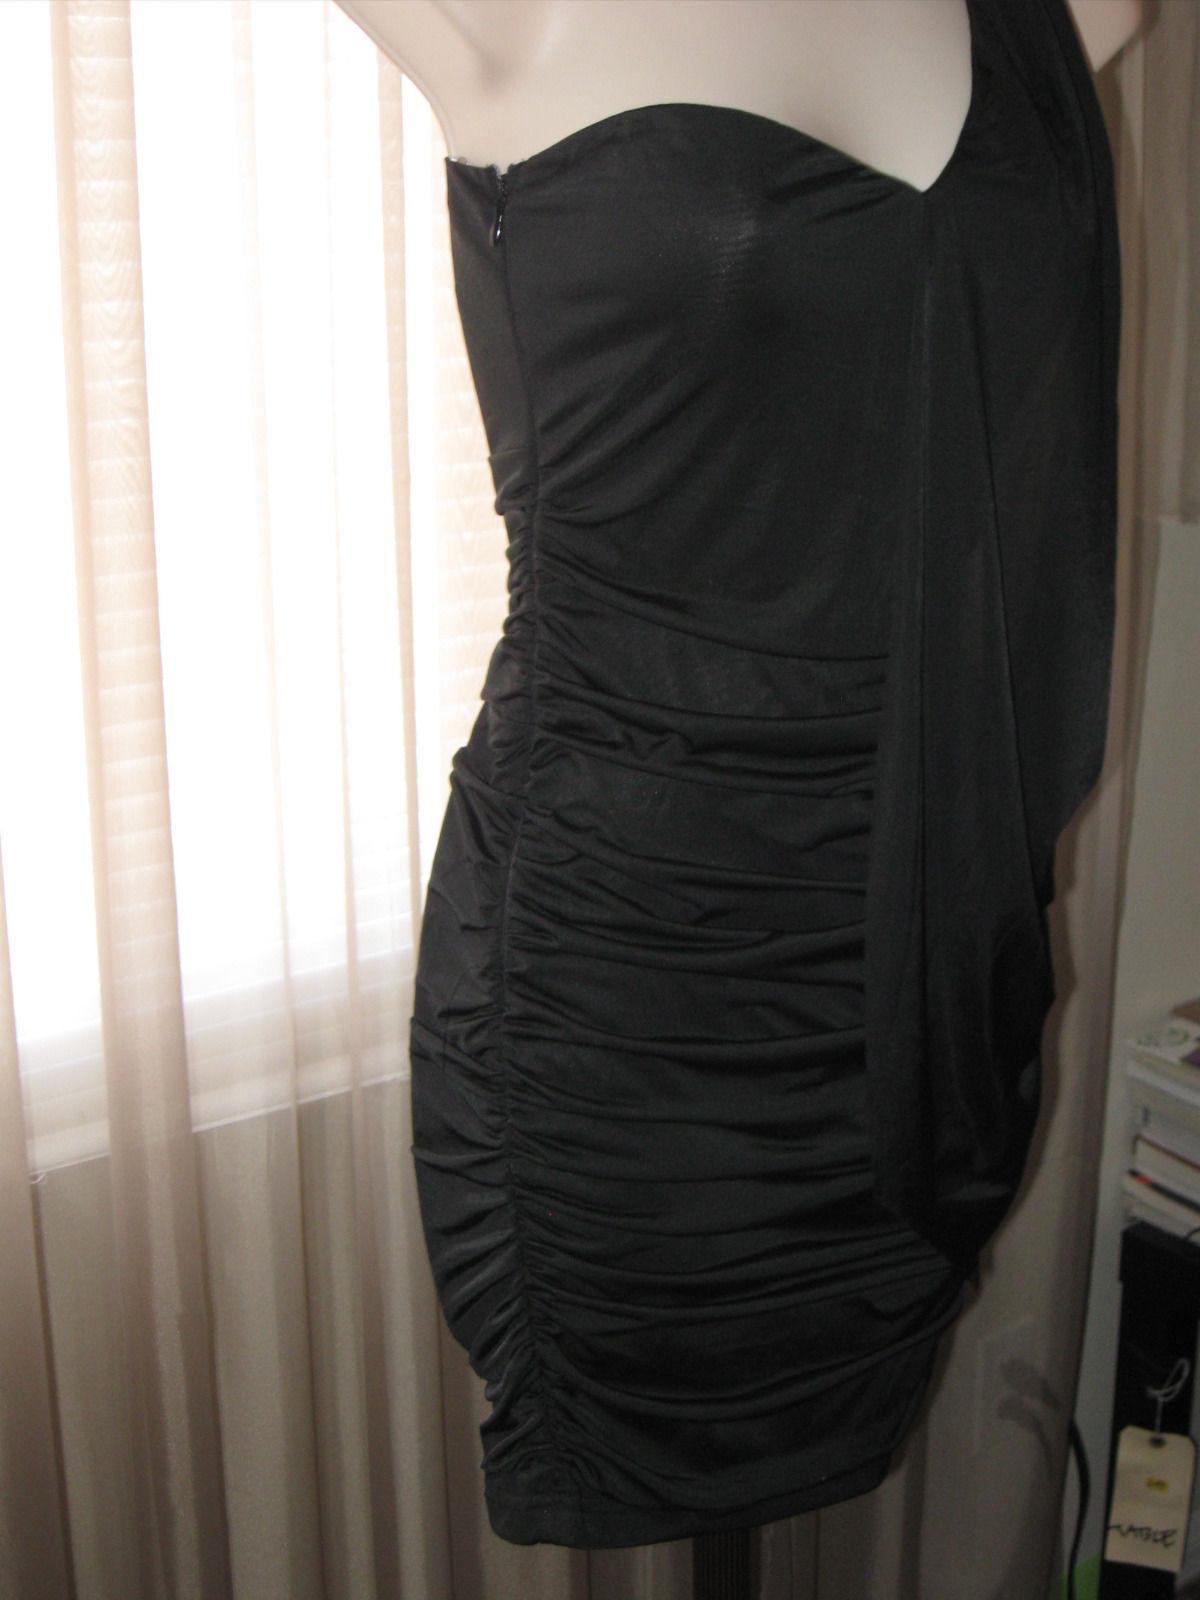 59a0e2d74e3f XS/S NIKIBIKI Black Pencil One-Shoulder Party Elegnant Waterfall Front Dress